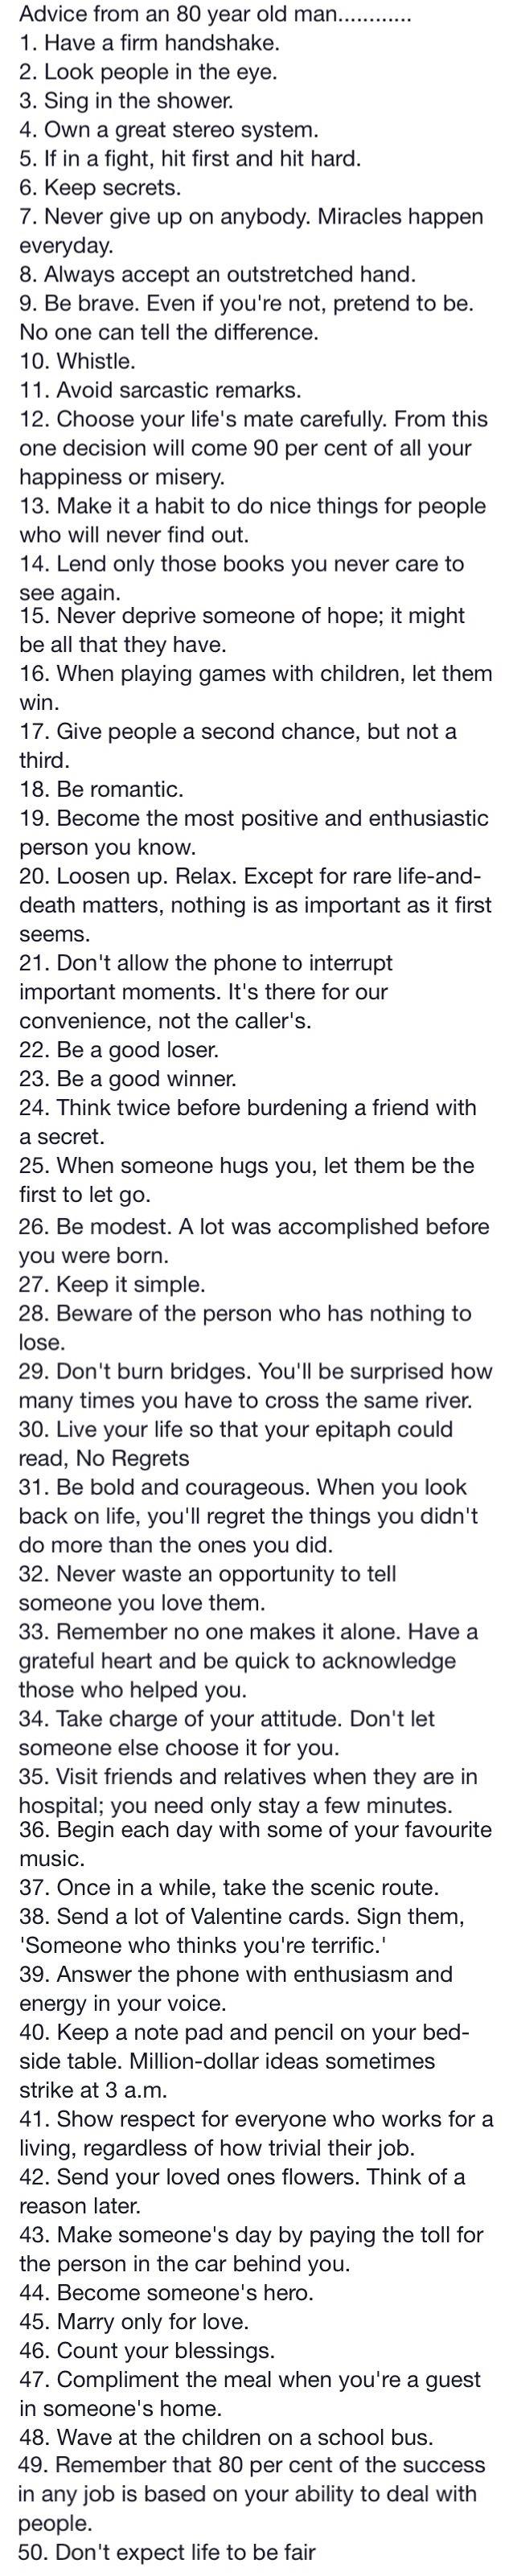 Excellent advice <<<< TRUE TRUE TRUE. Especially the last on e